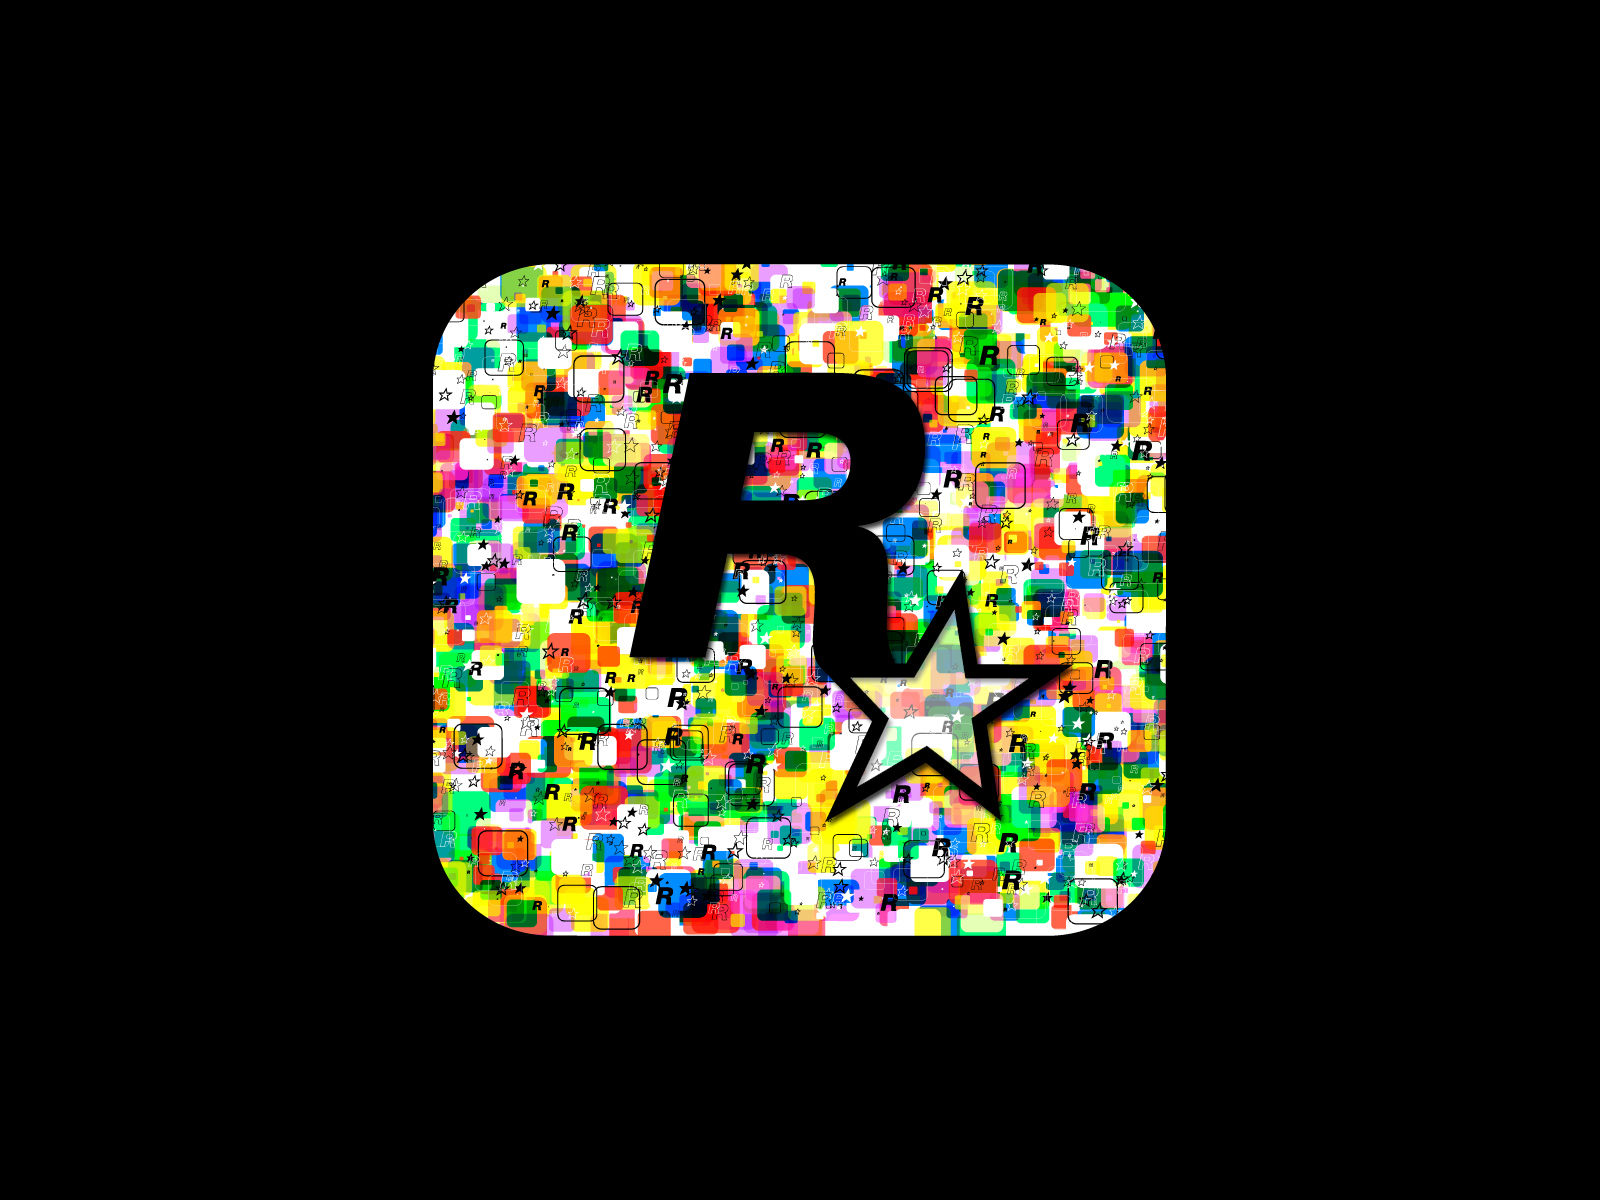 Free Adult Games Phone